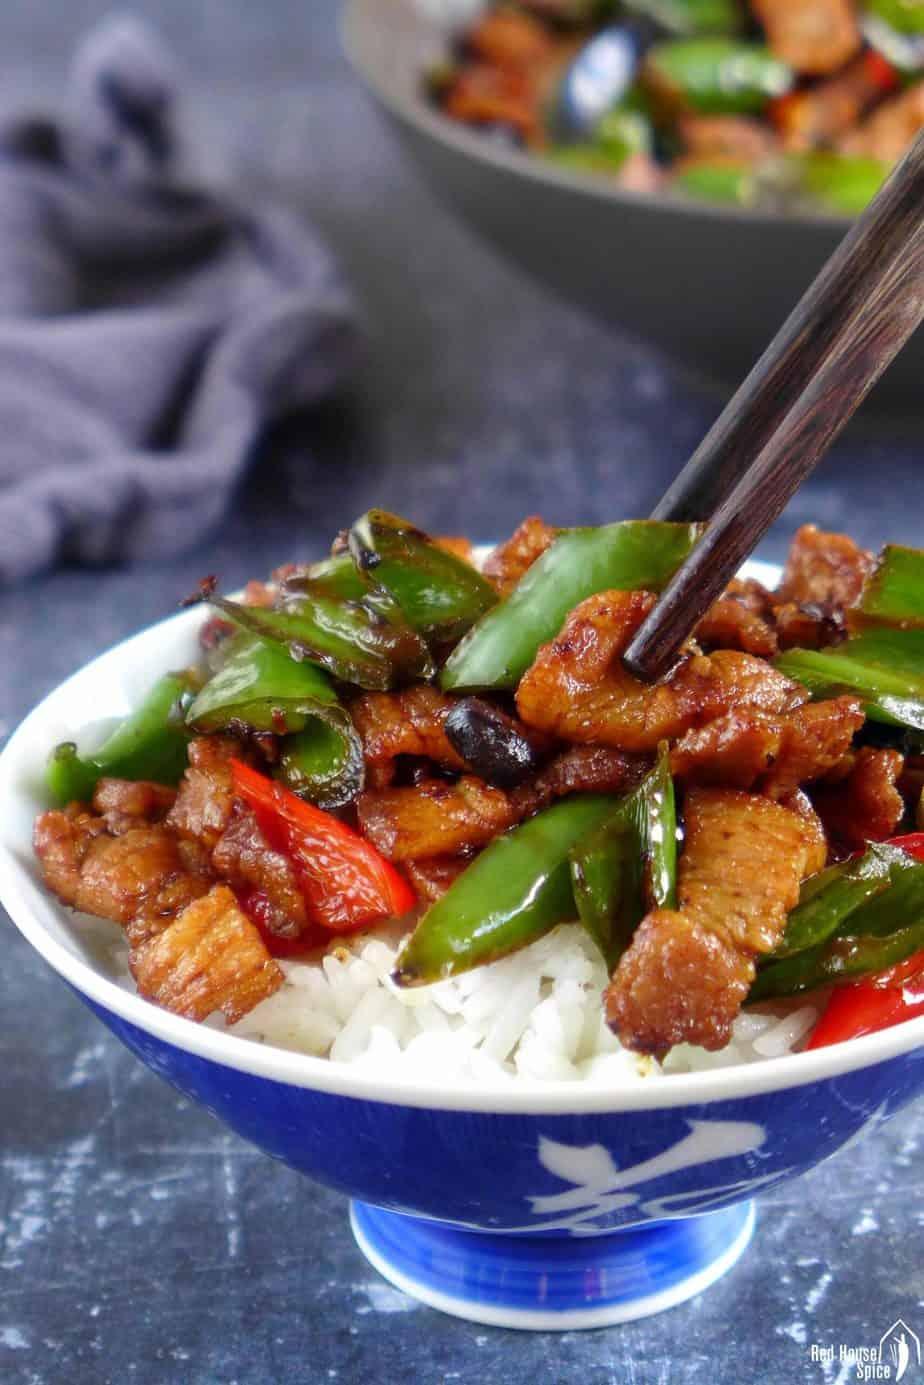 Chopsticks picking up Hunan pork